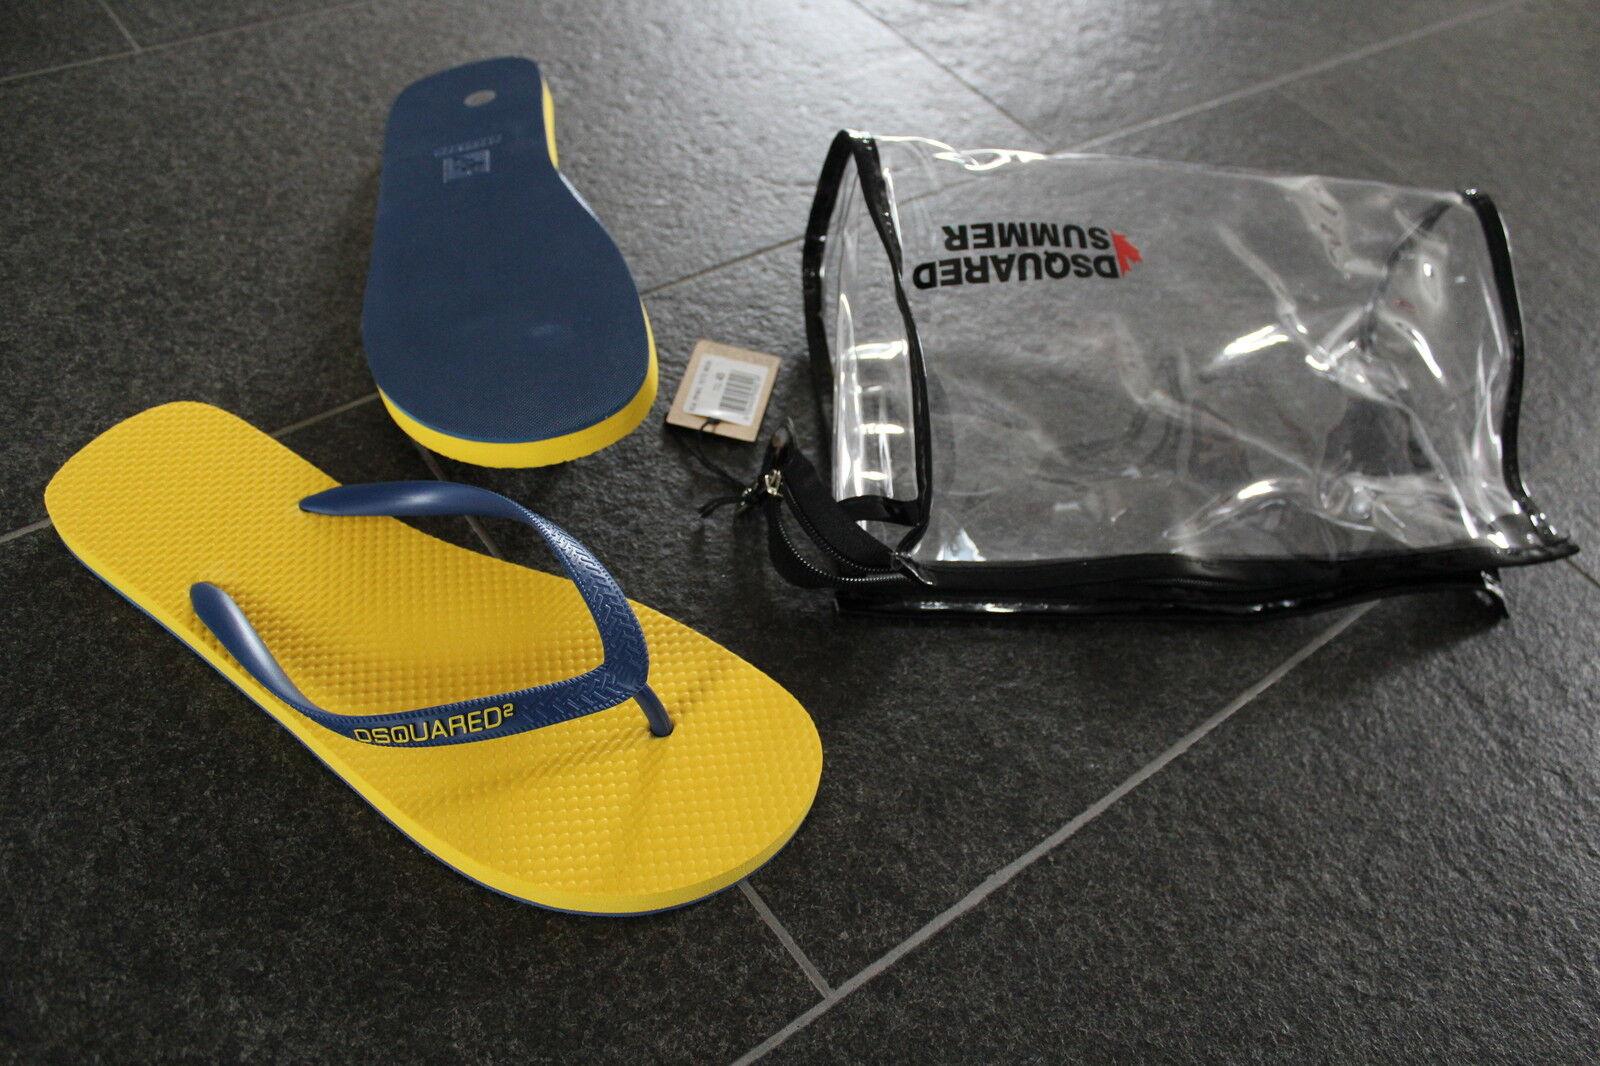 DSQUARED2 S/S 2015 SANDALEN Sandals SCHUHE 45 + KOSMETIKTASCHE very cool shoes